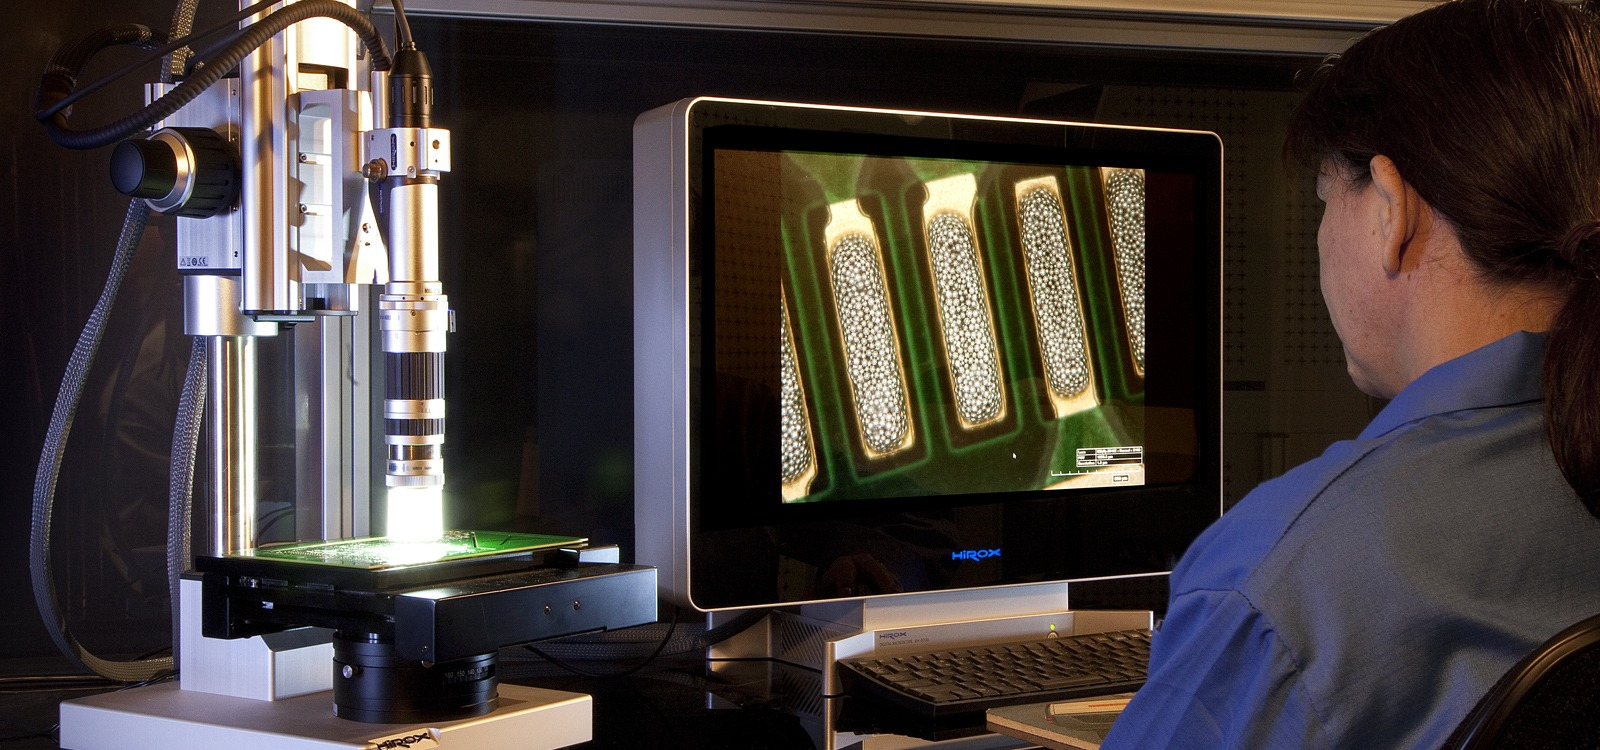 Interconics PCB Inspection